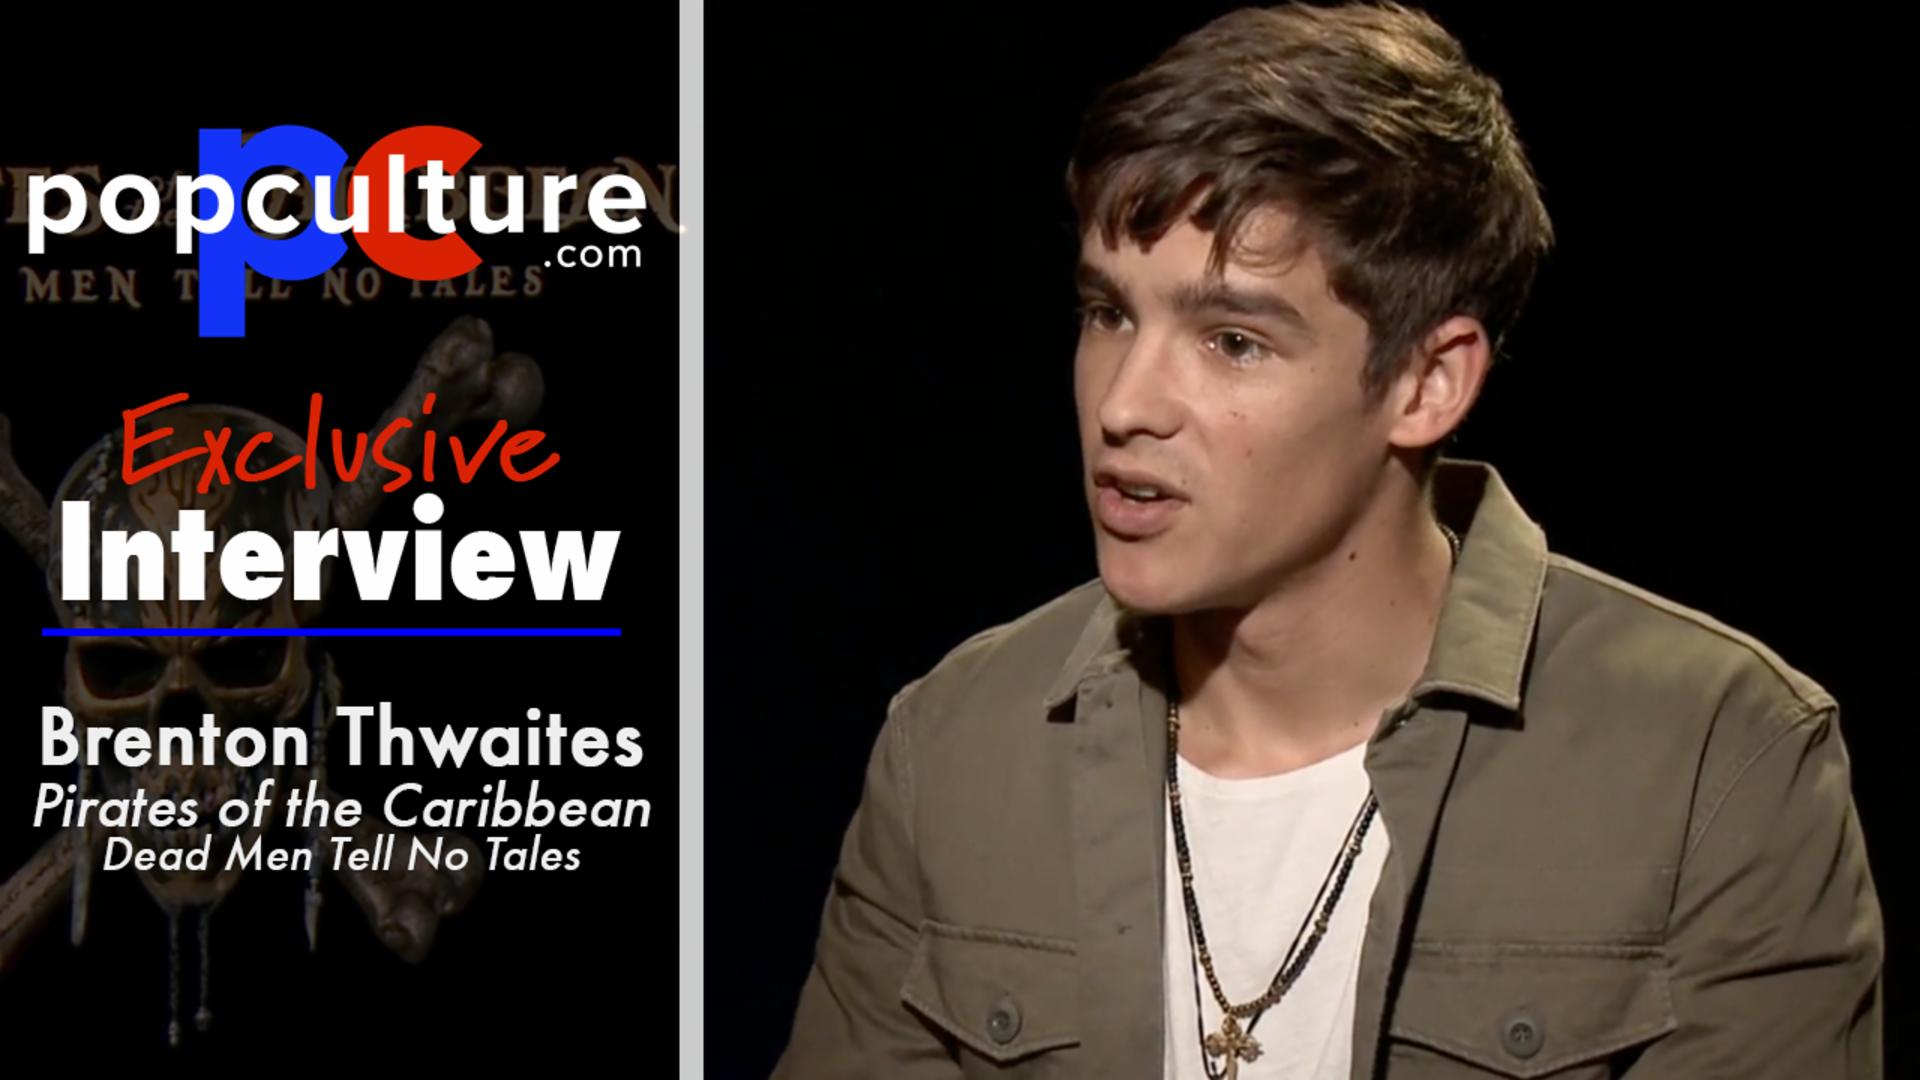 Brenton Thwaites Talks Pirates 5 screen capture